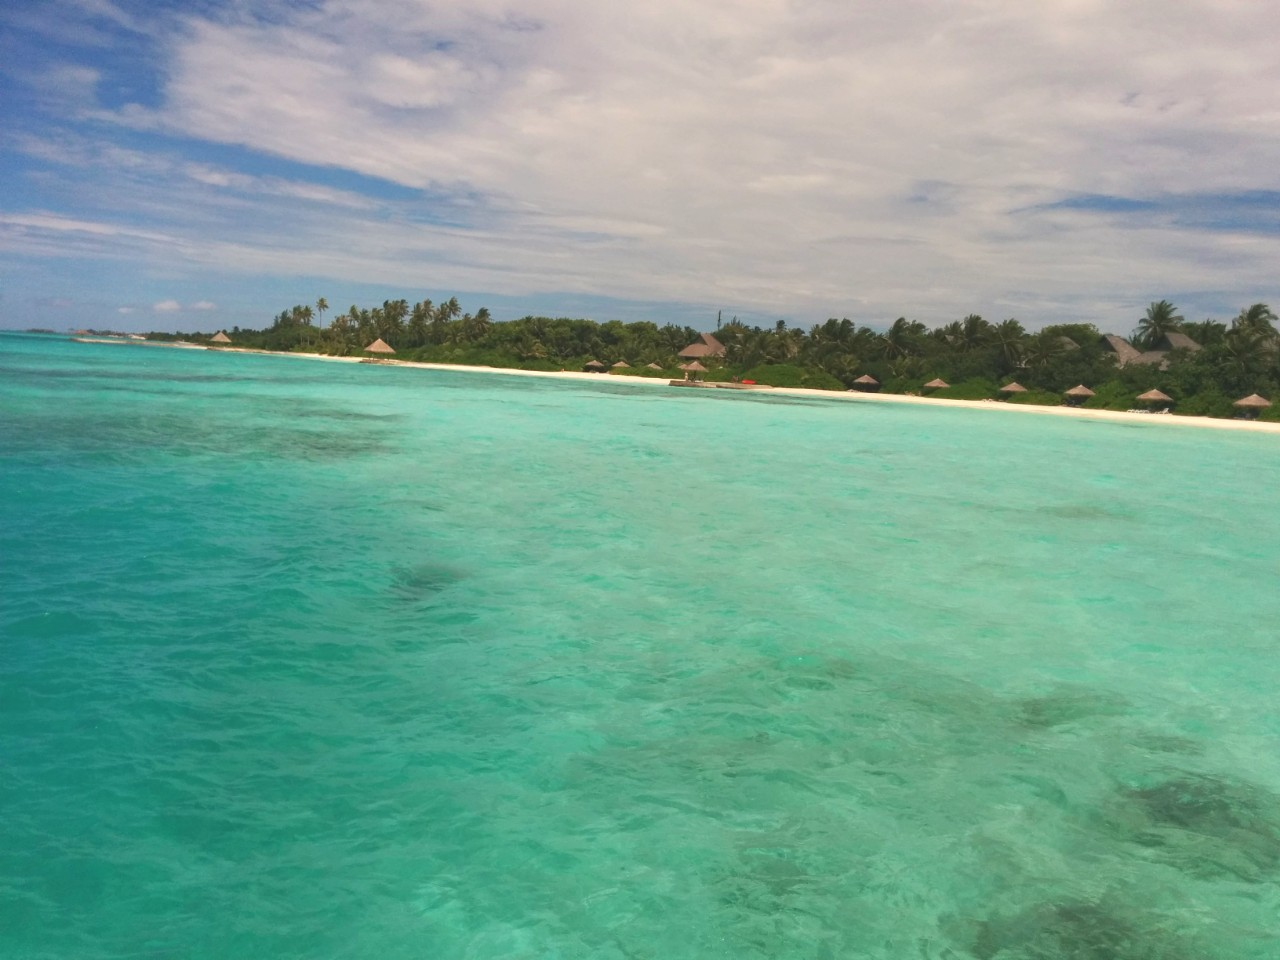 Mi viaje a Maldivas